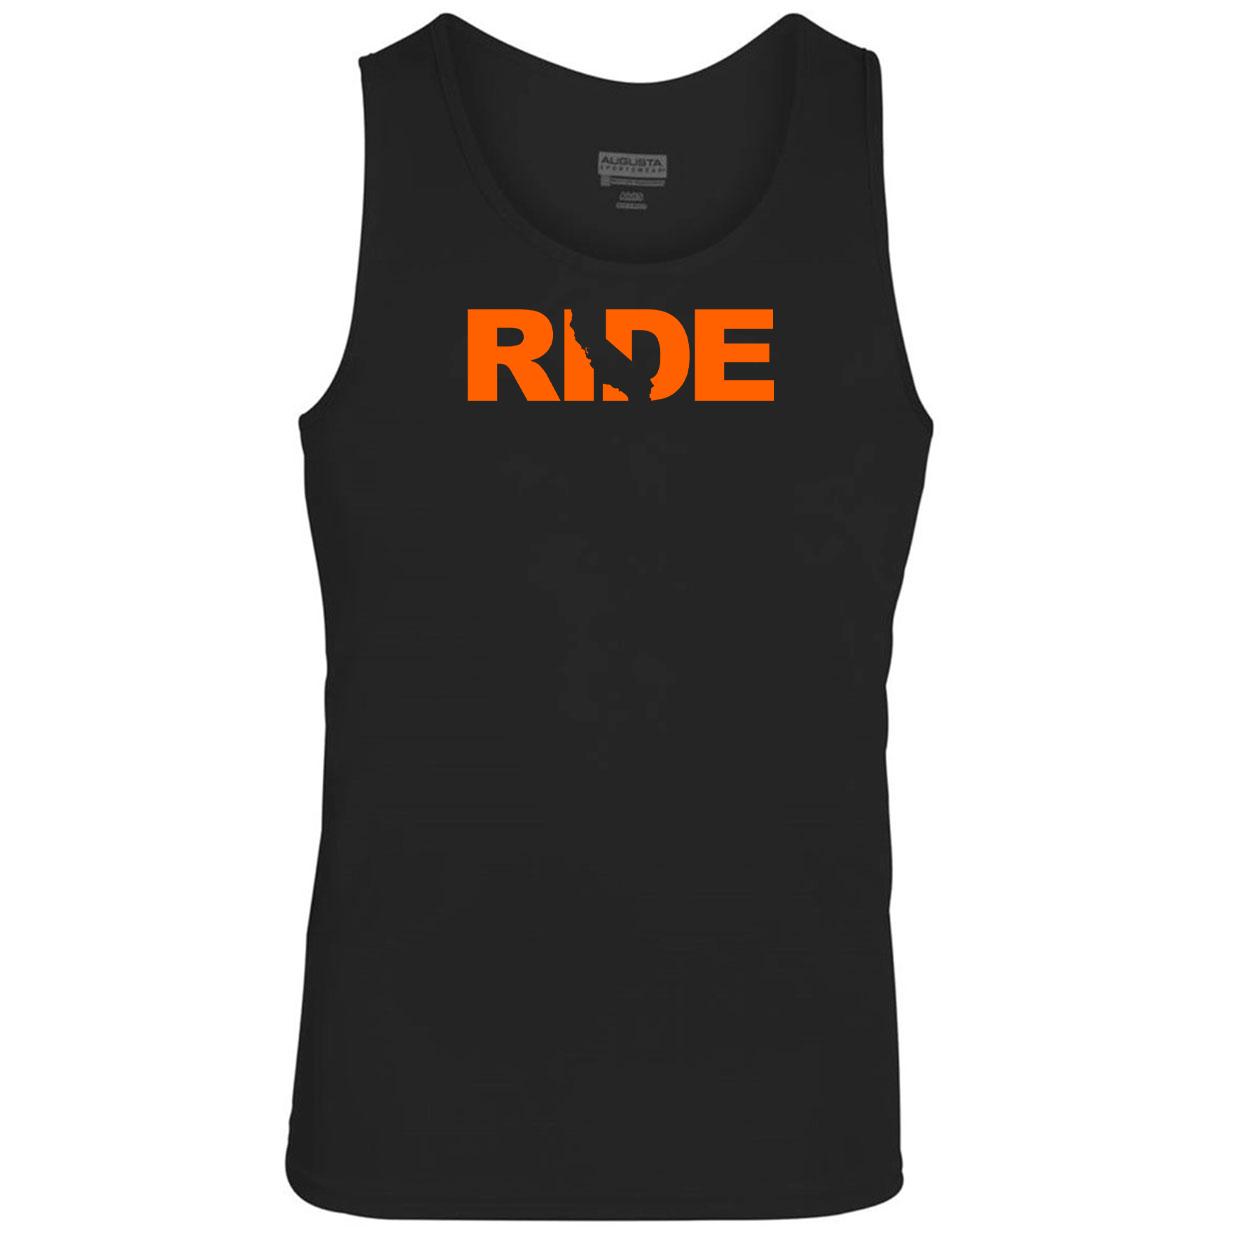 Ride California Classic Youth Unisex Performance Tank Top Black (Orange Logo)